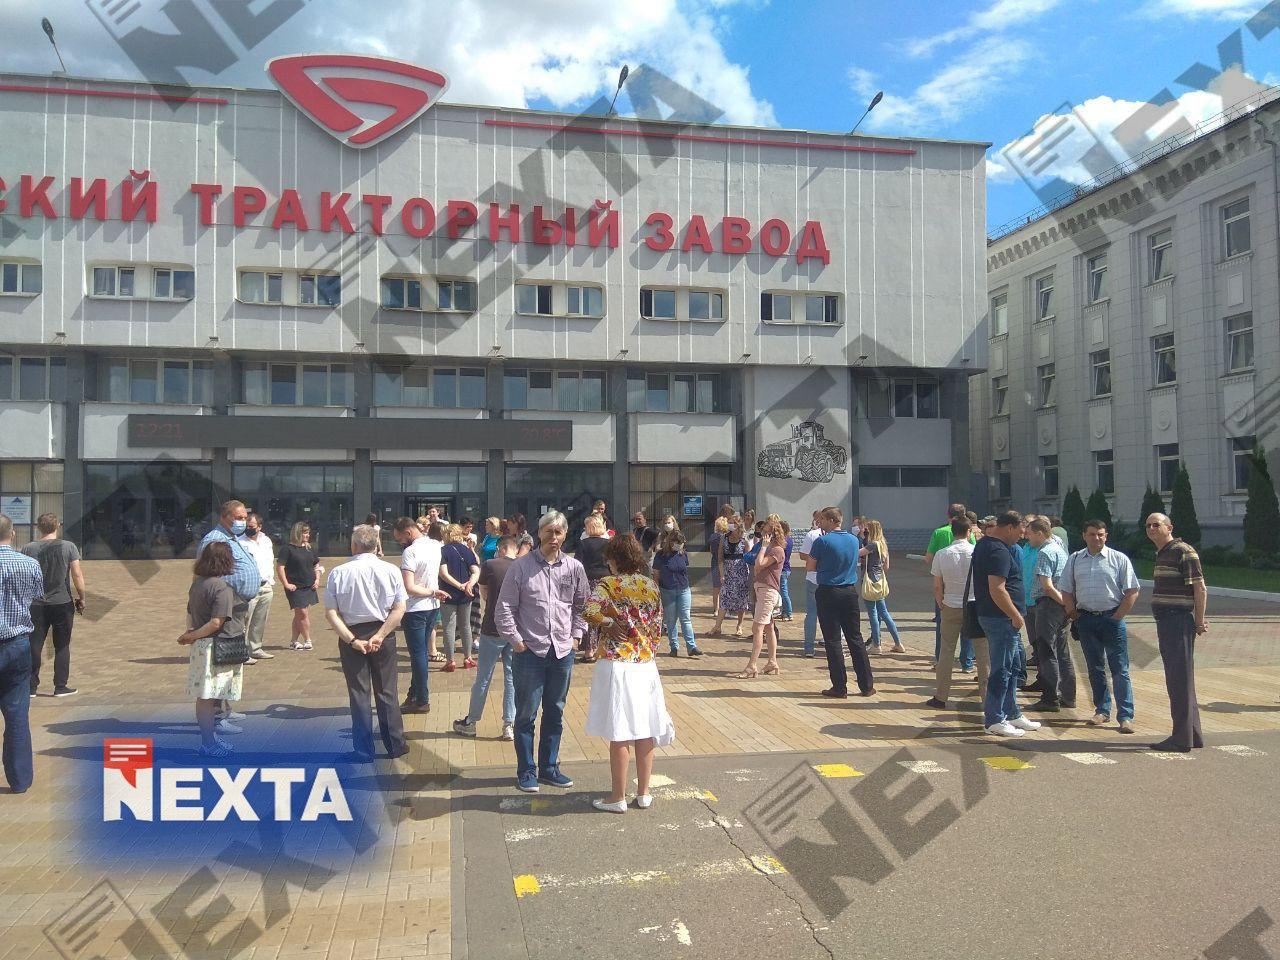 bielorussia-huelga-tractor2.jpg